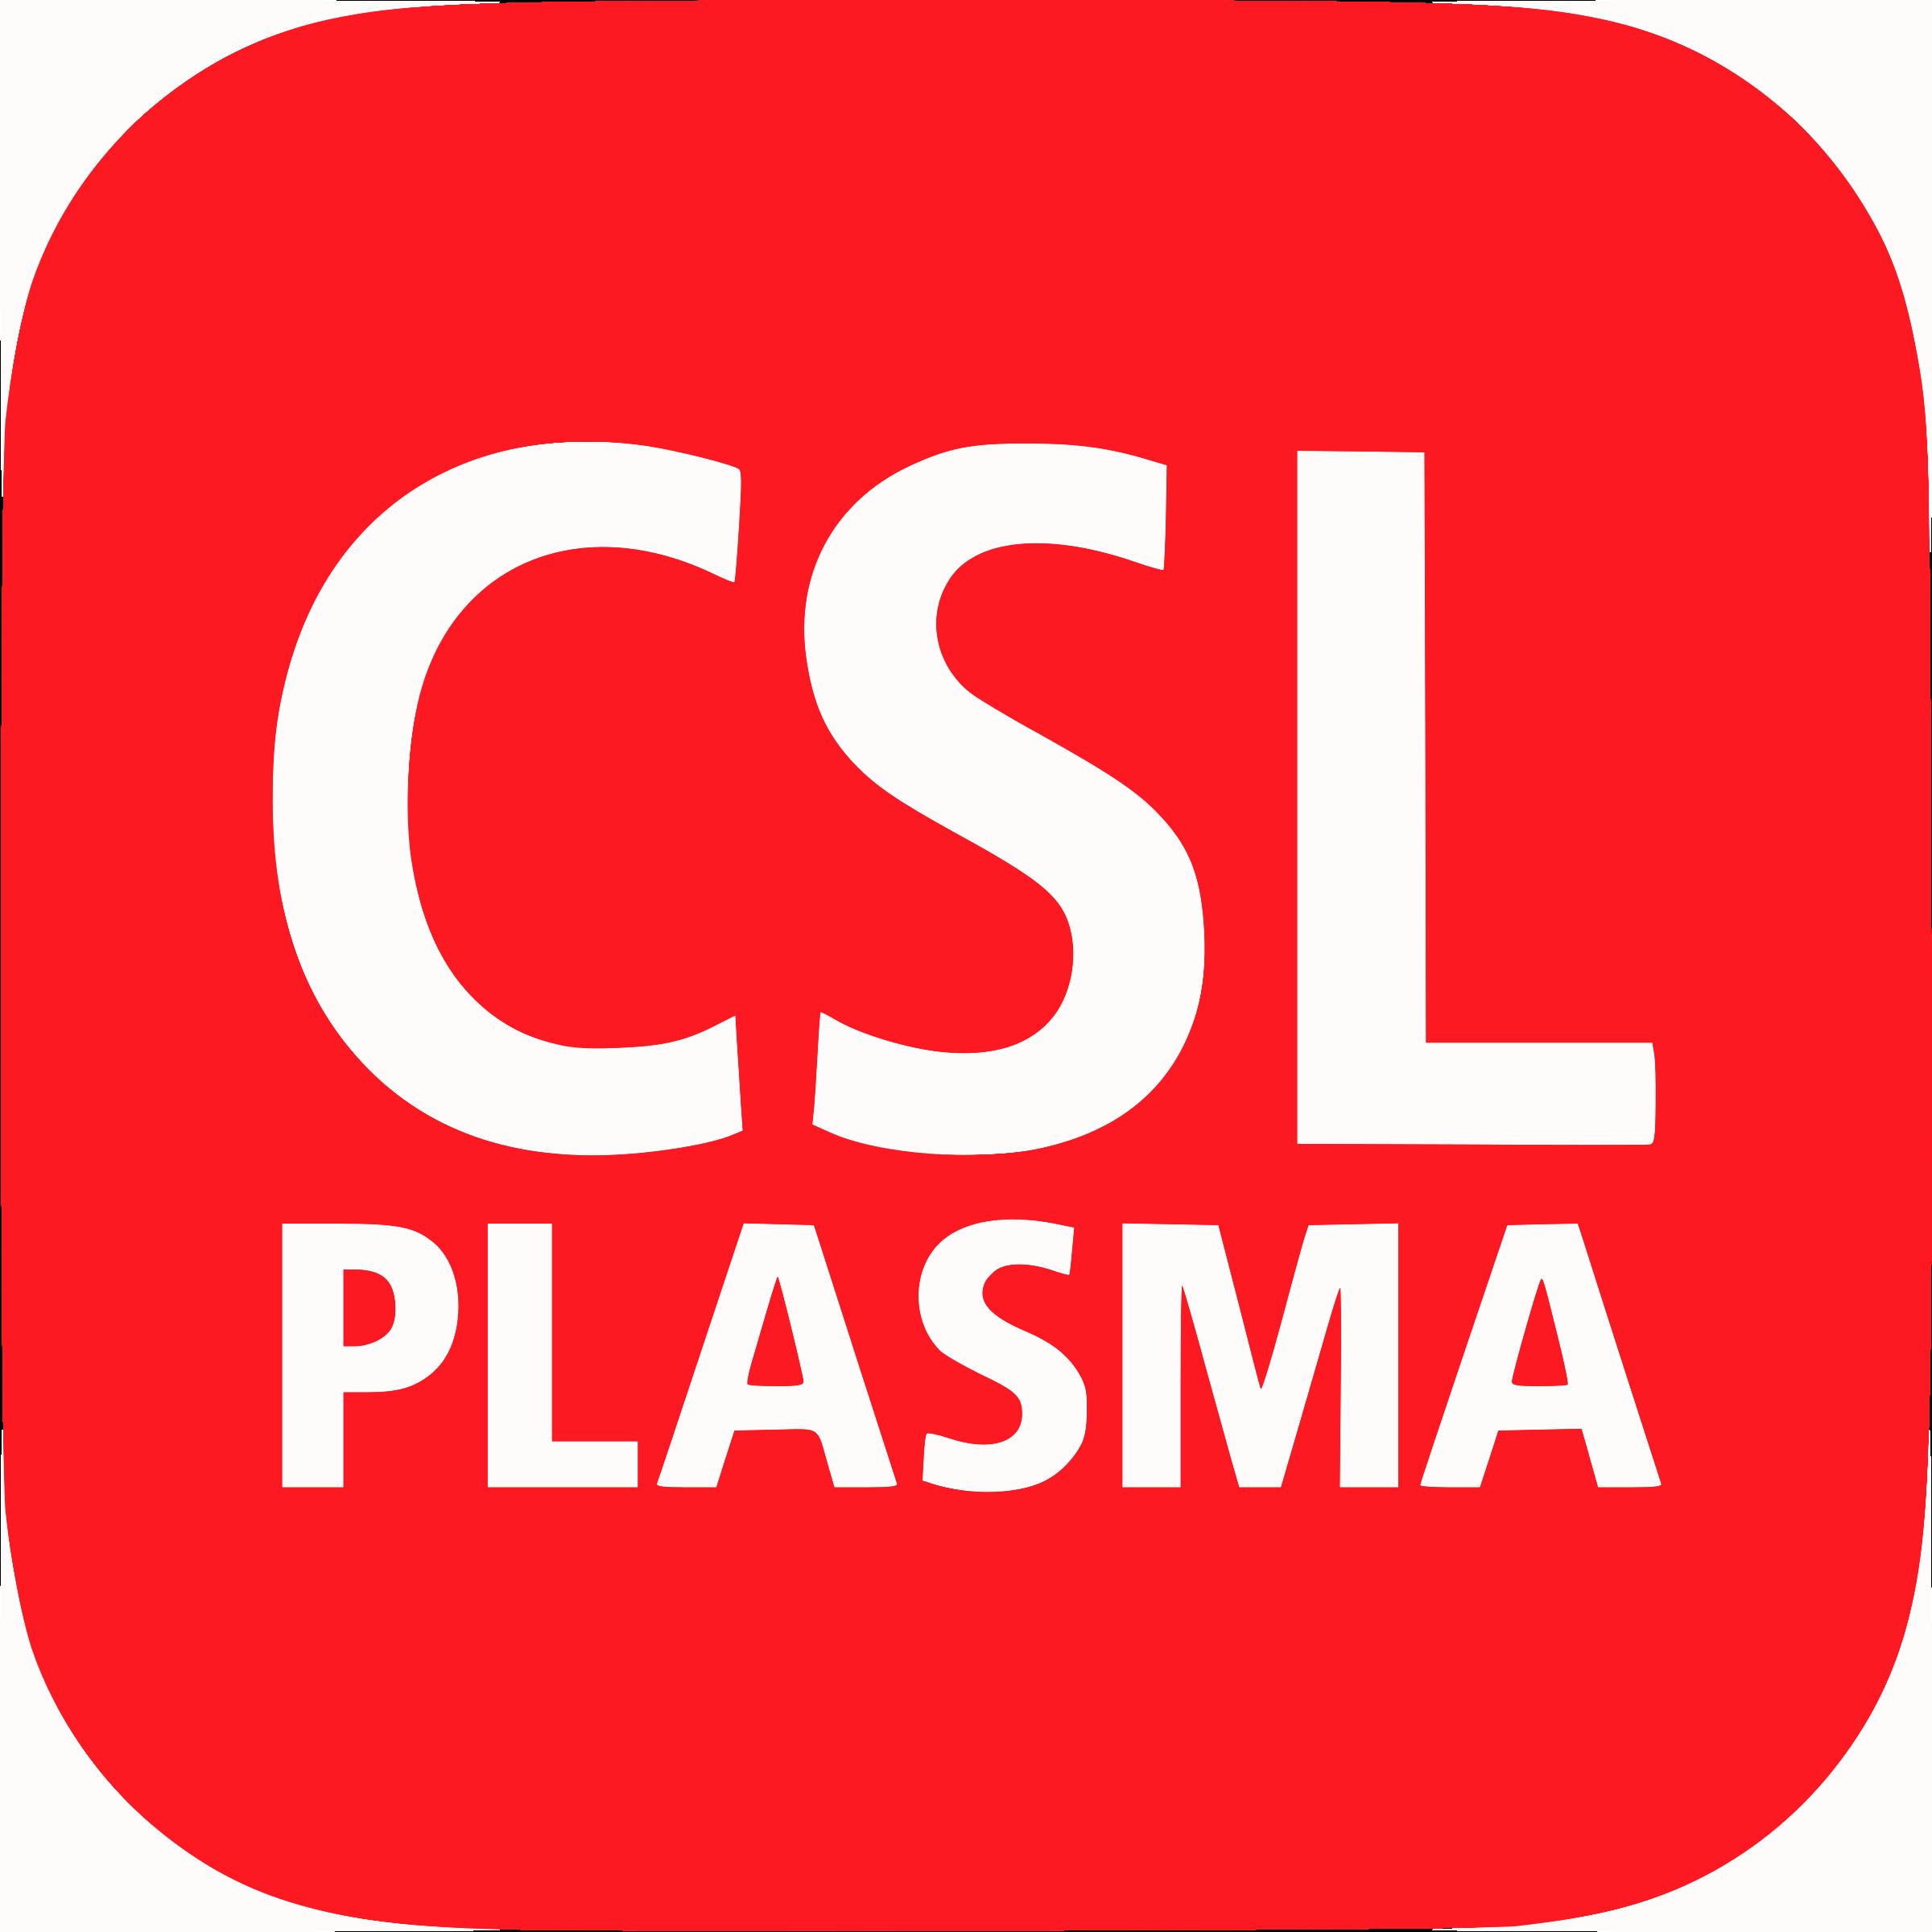 CSL Plasma Logo PNG Transparent & SVG Vector.